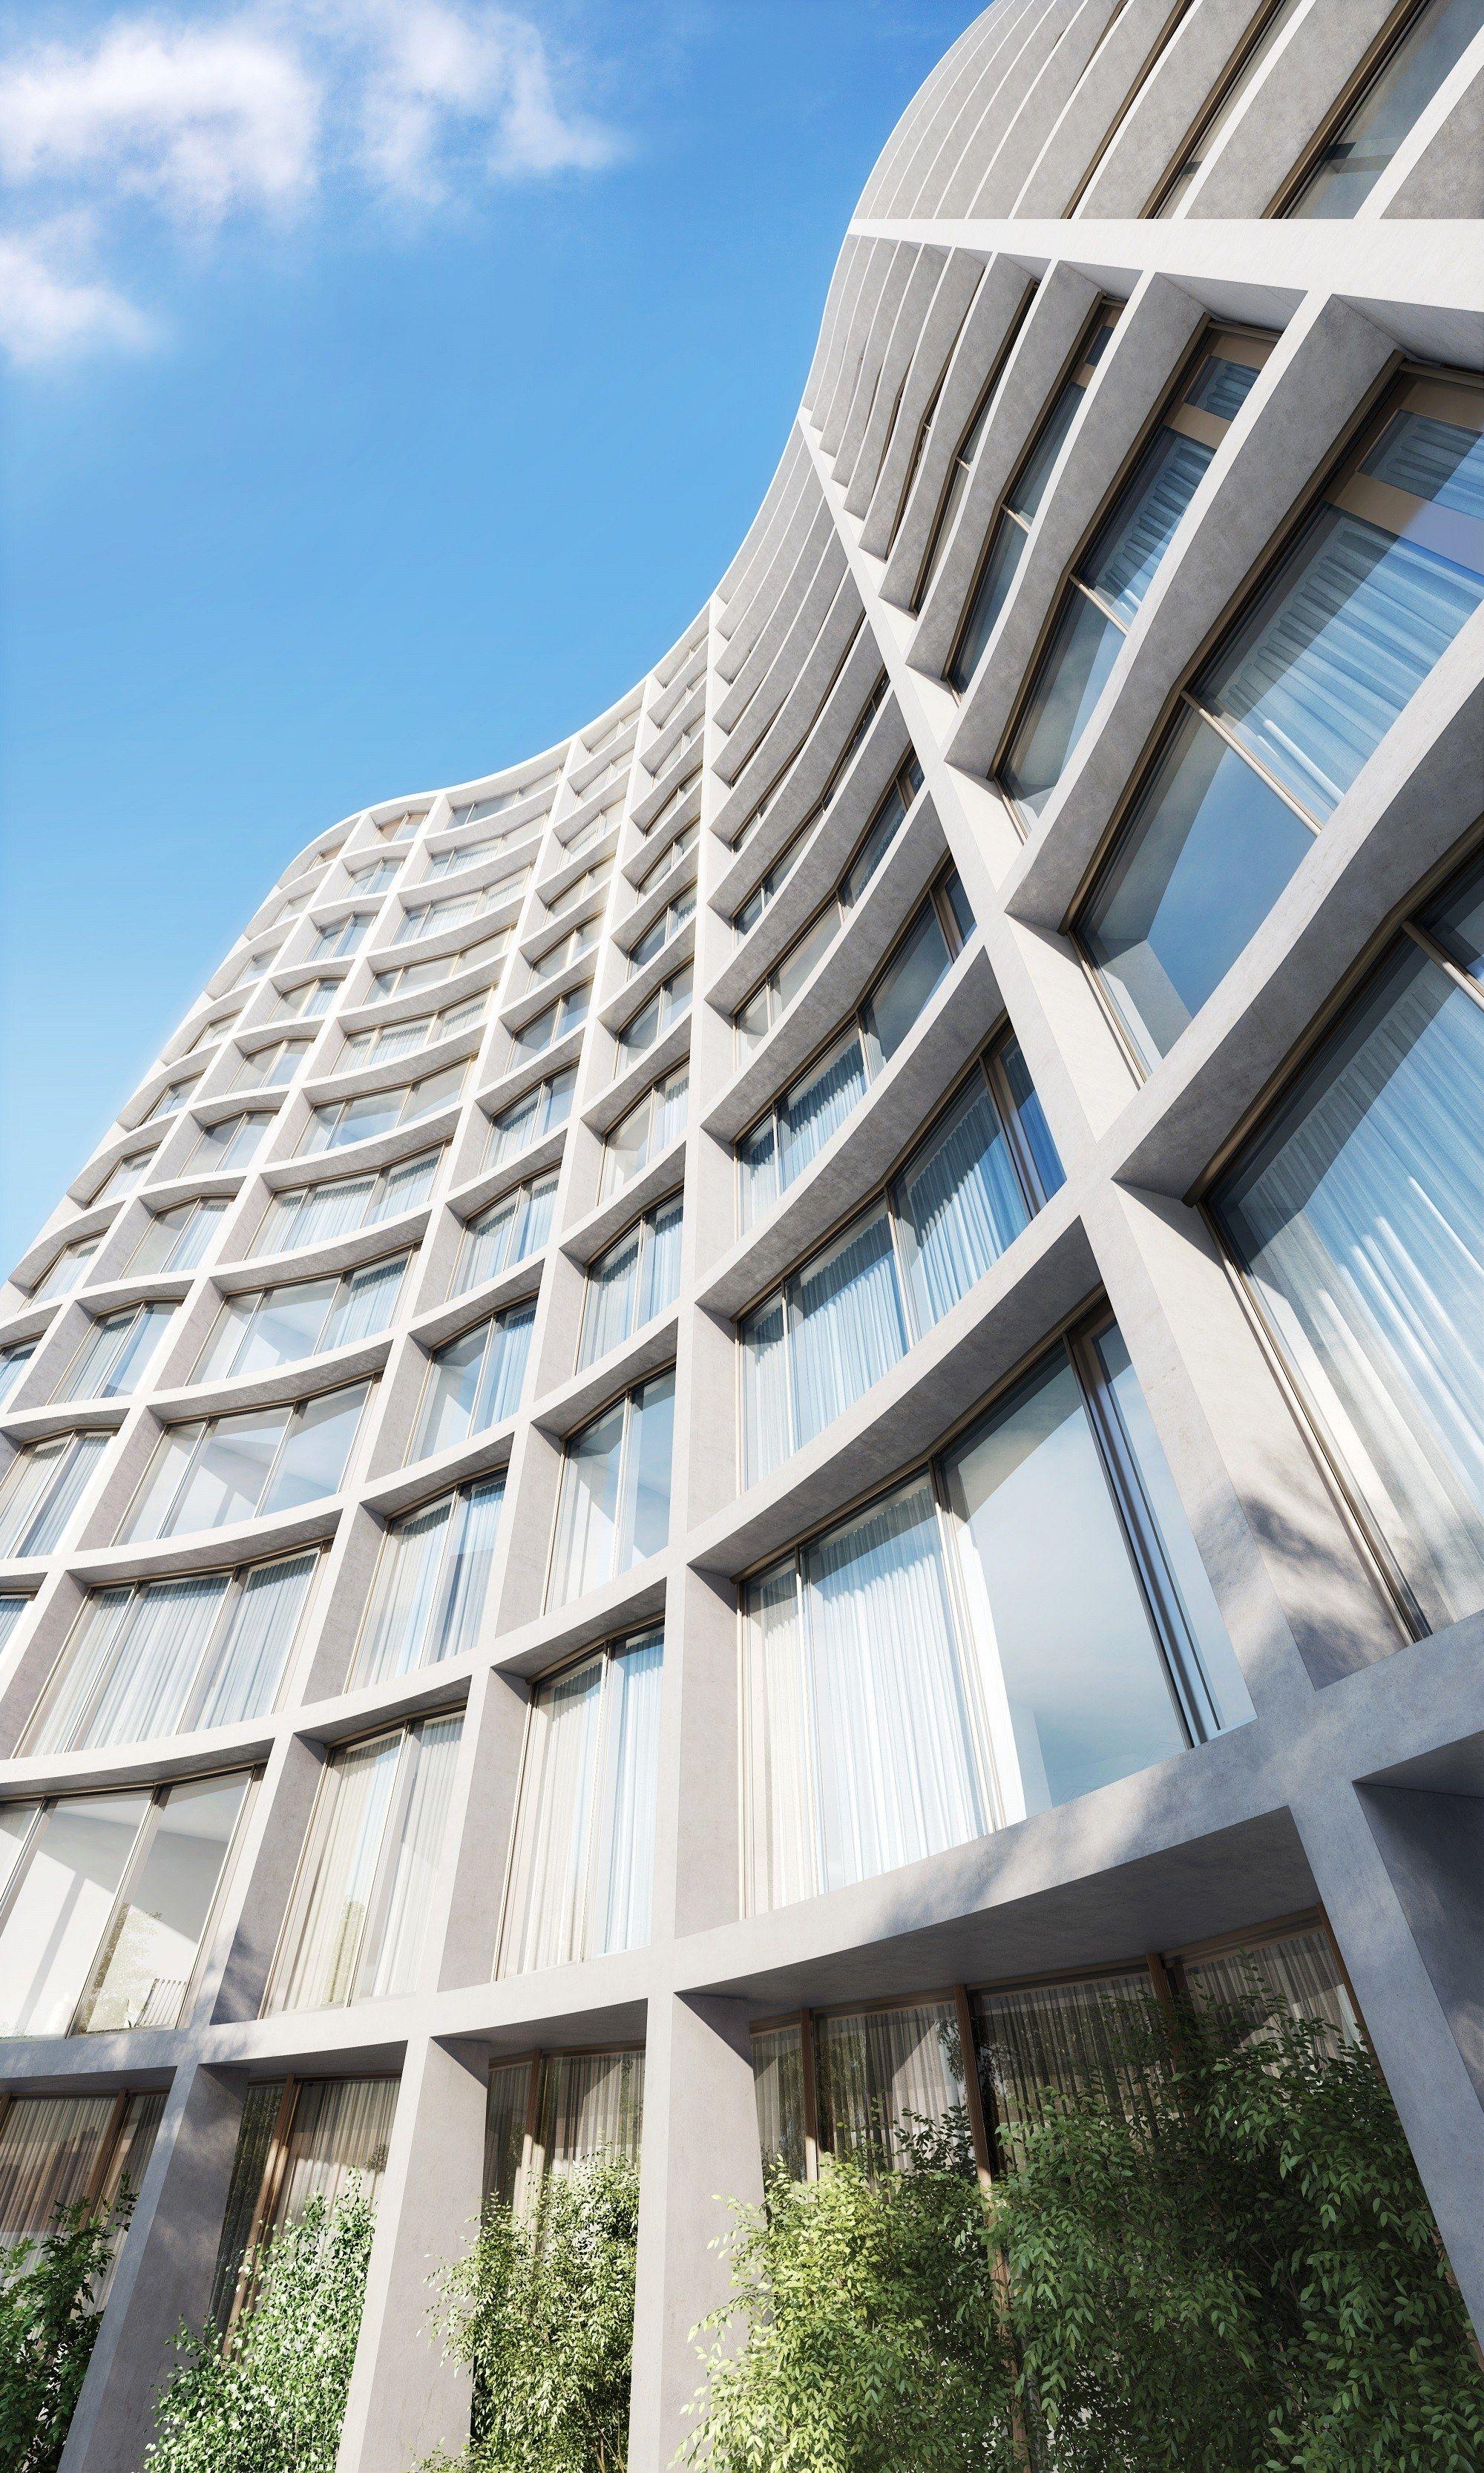 Inside Herzog De Meuron New Luxury Condos West Village NYC Photos | Architectural Digest